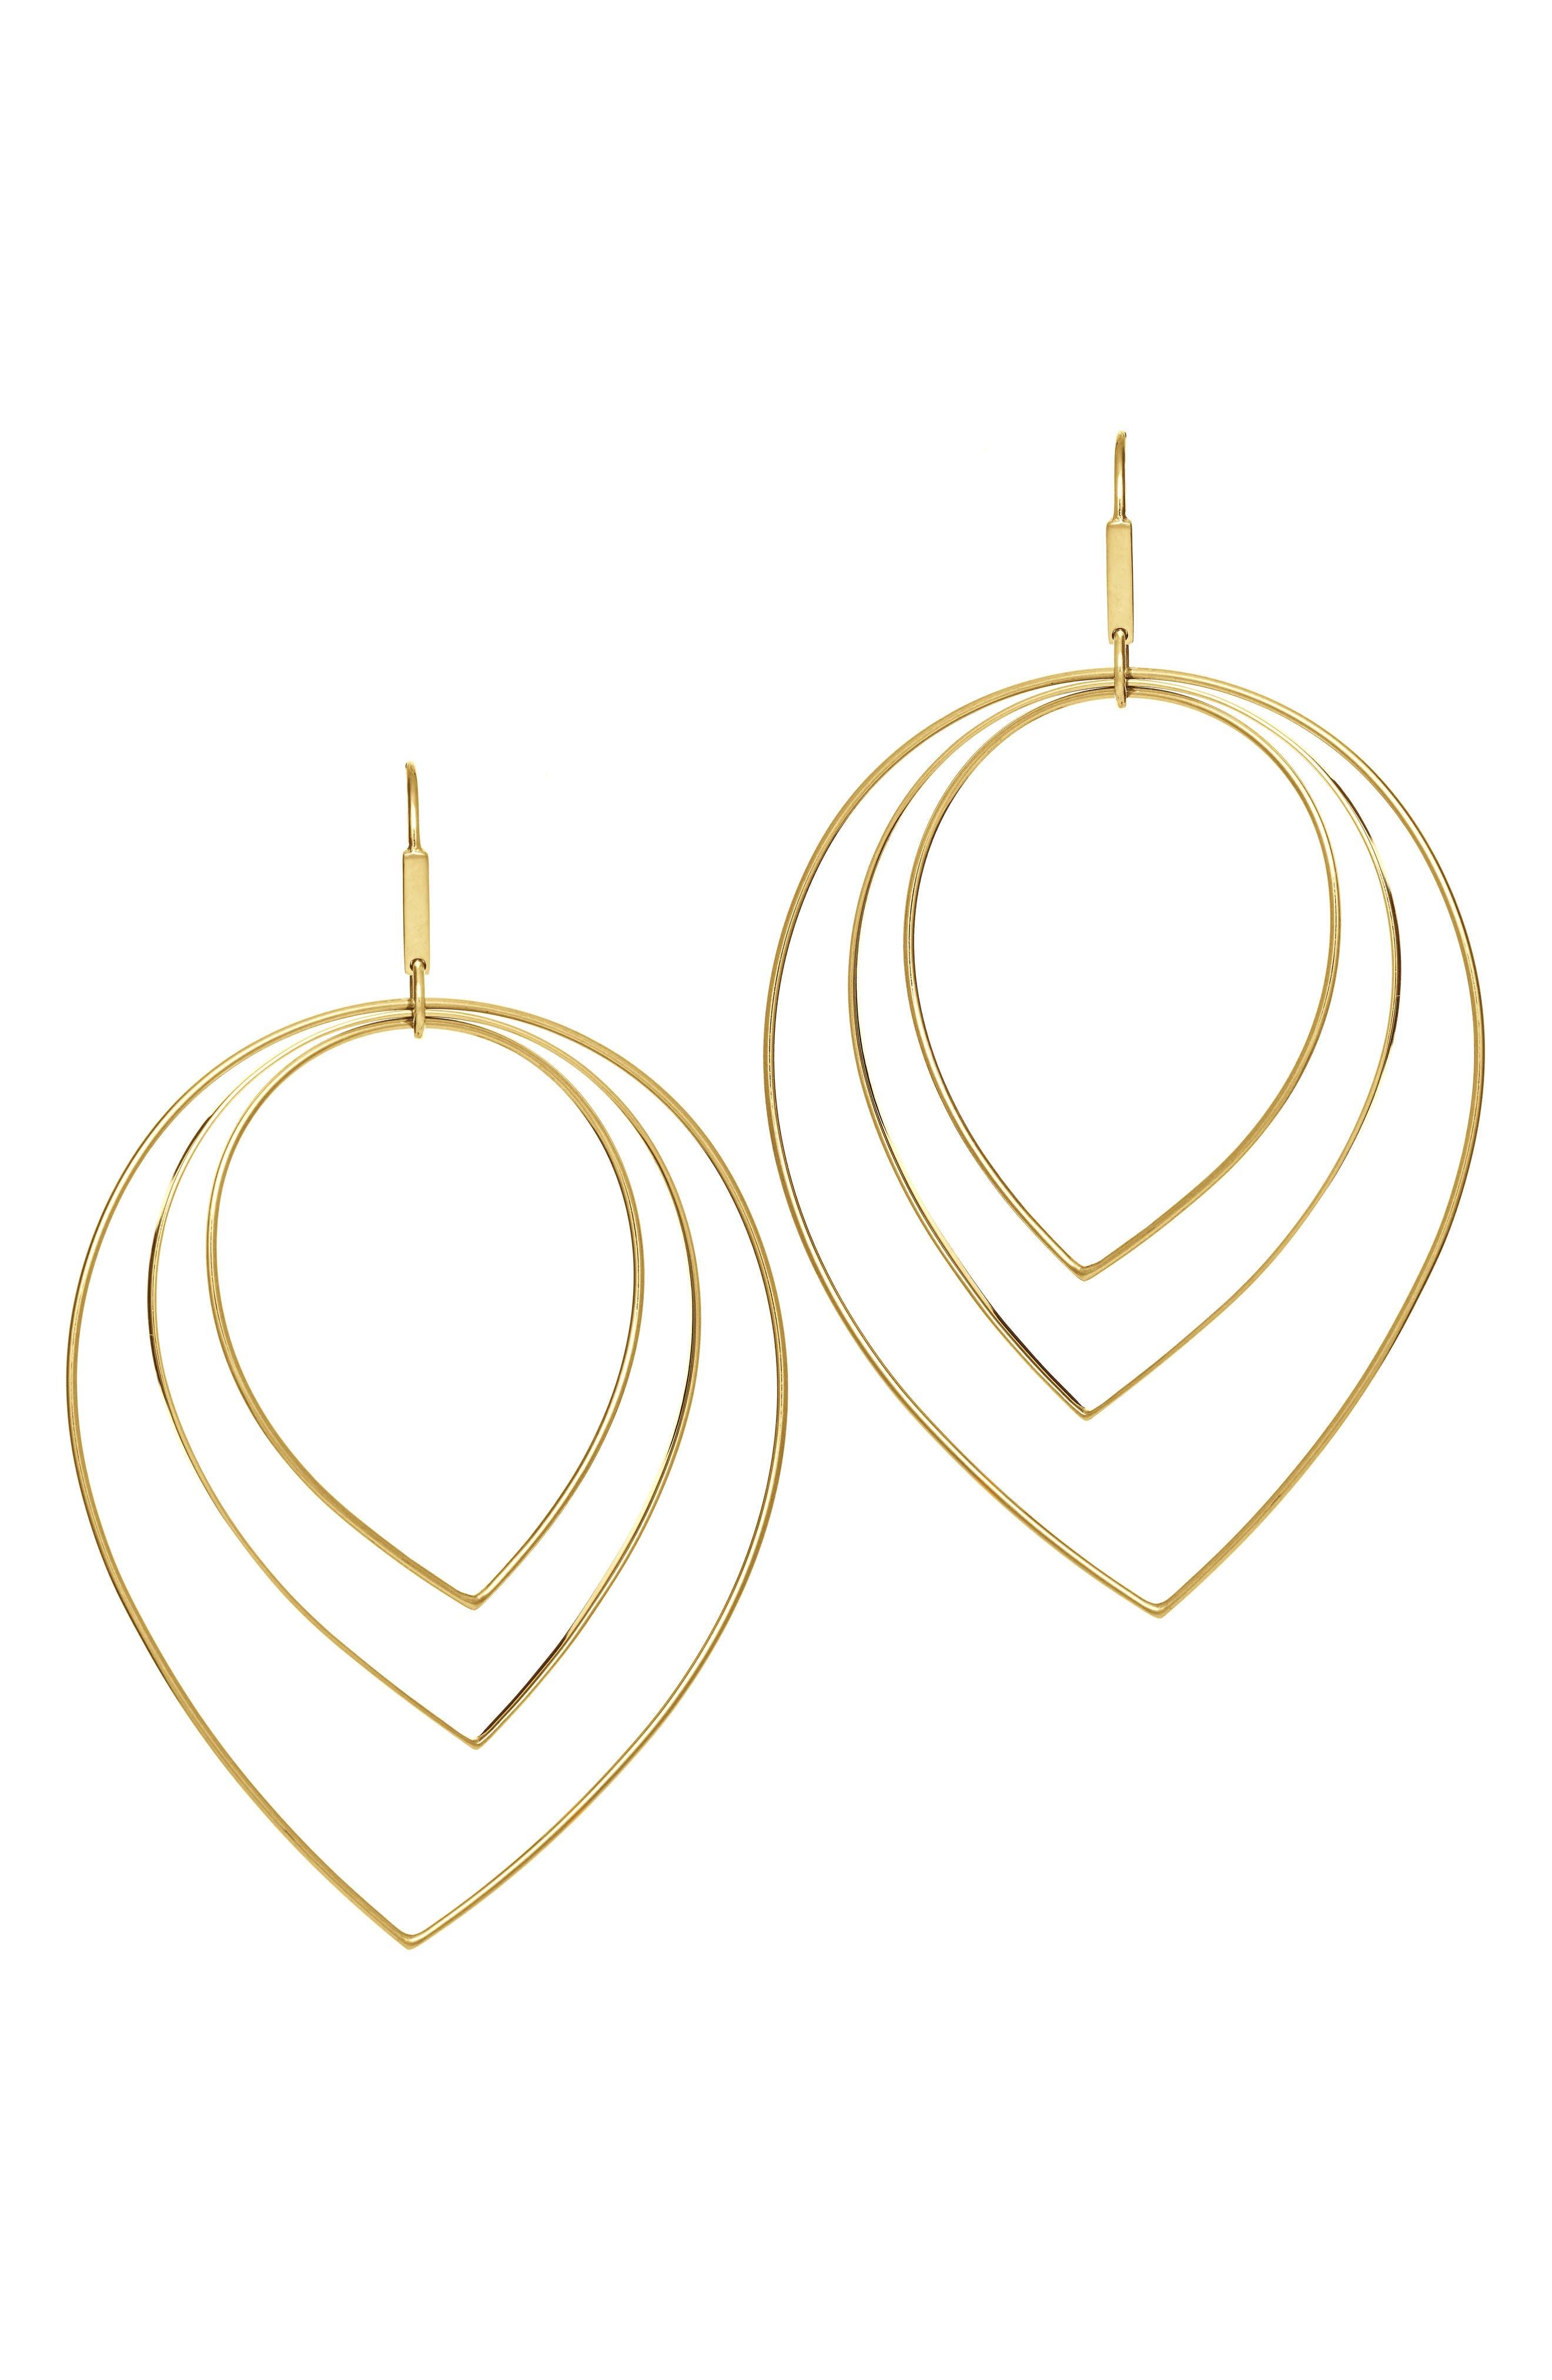 Drop Earrings,                             Main thumbnail 1, color,                             YELLOW GOLD